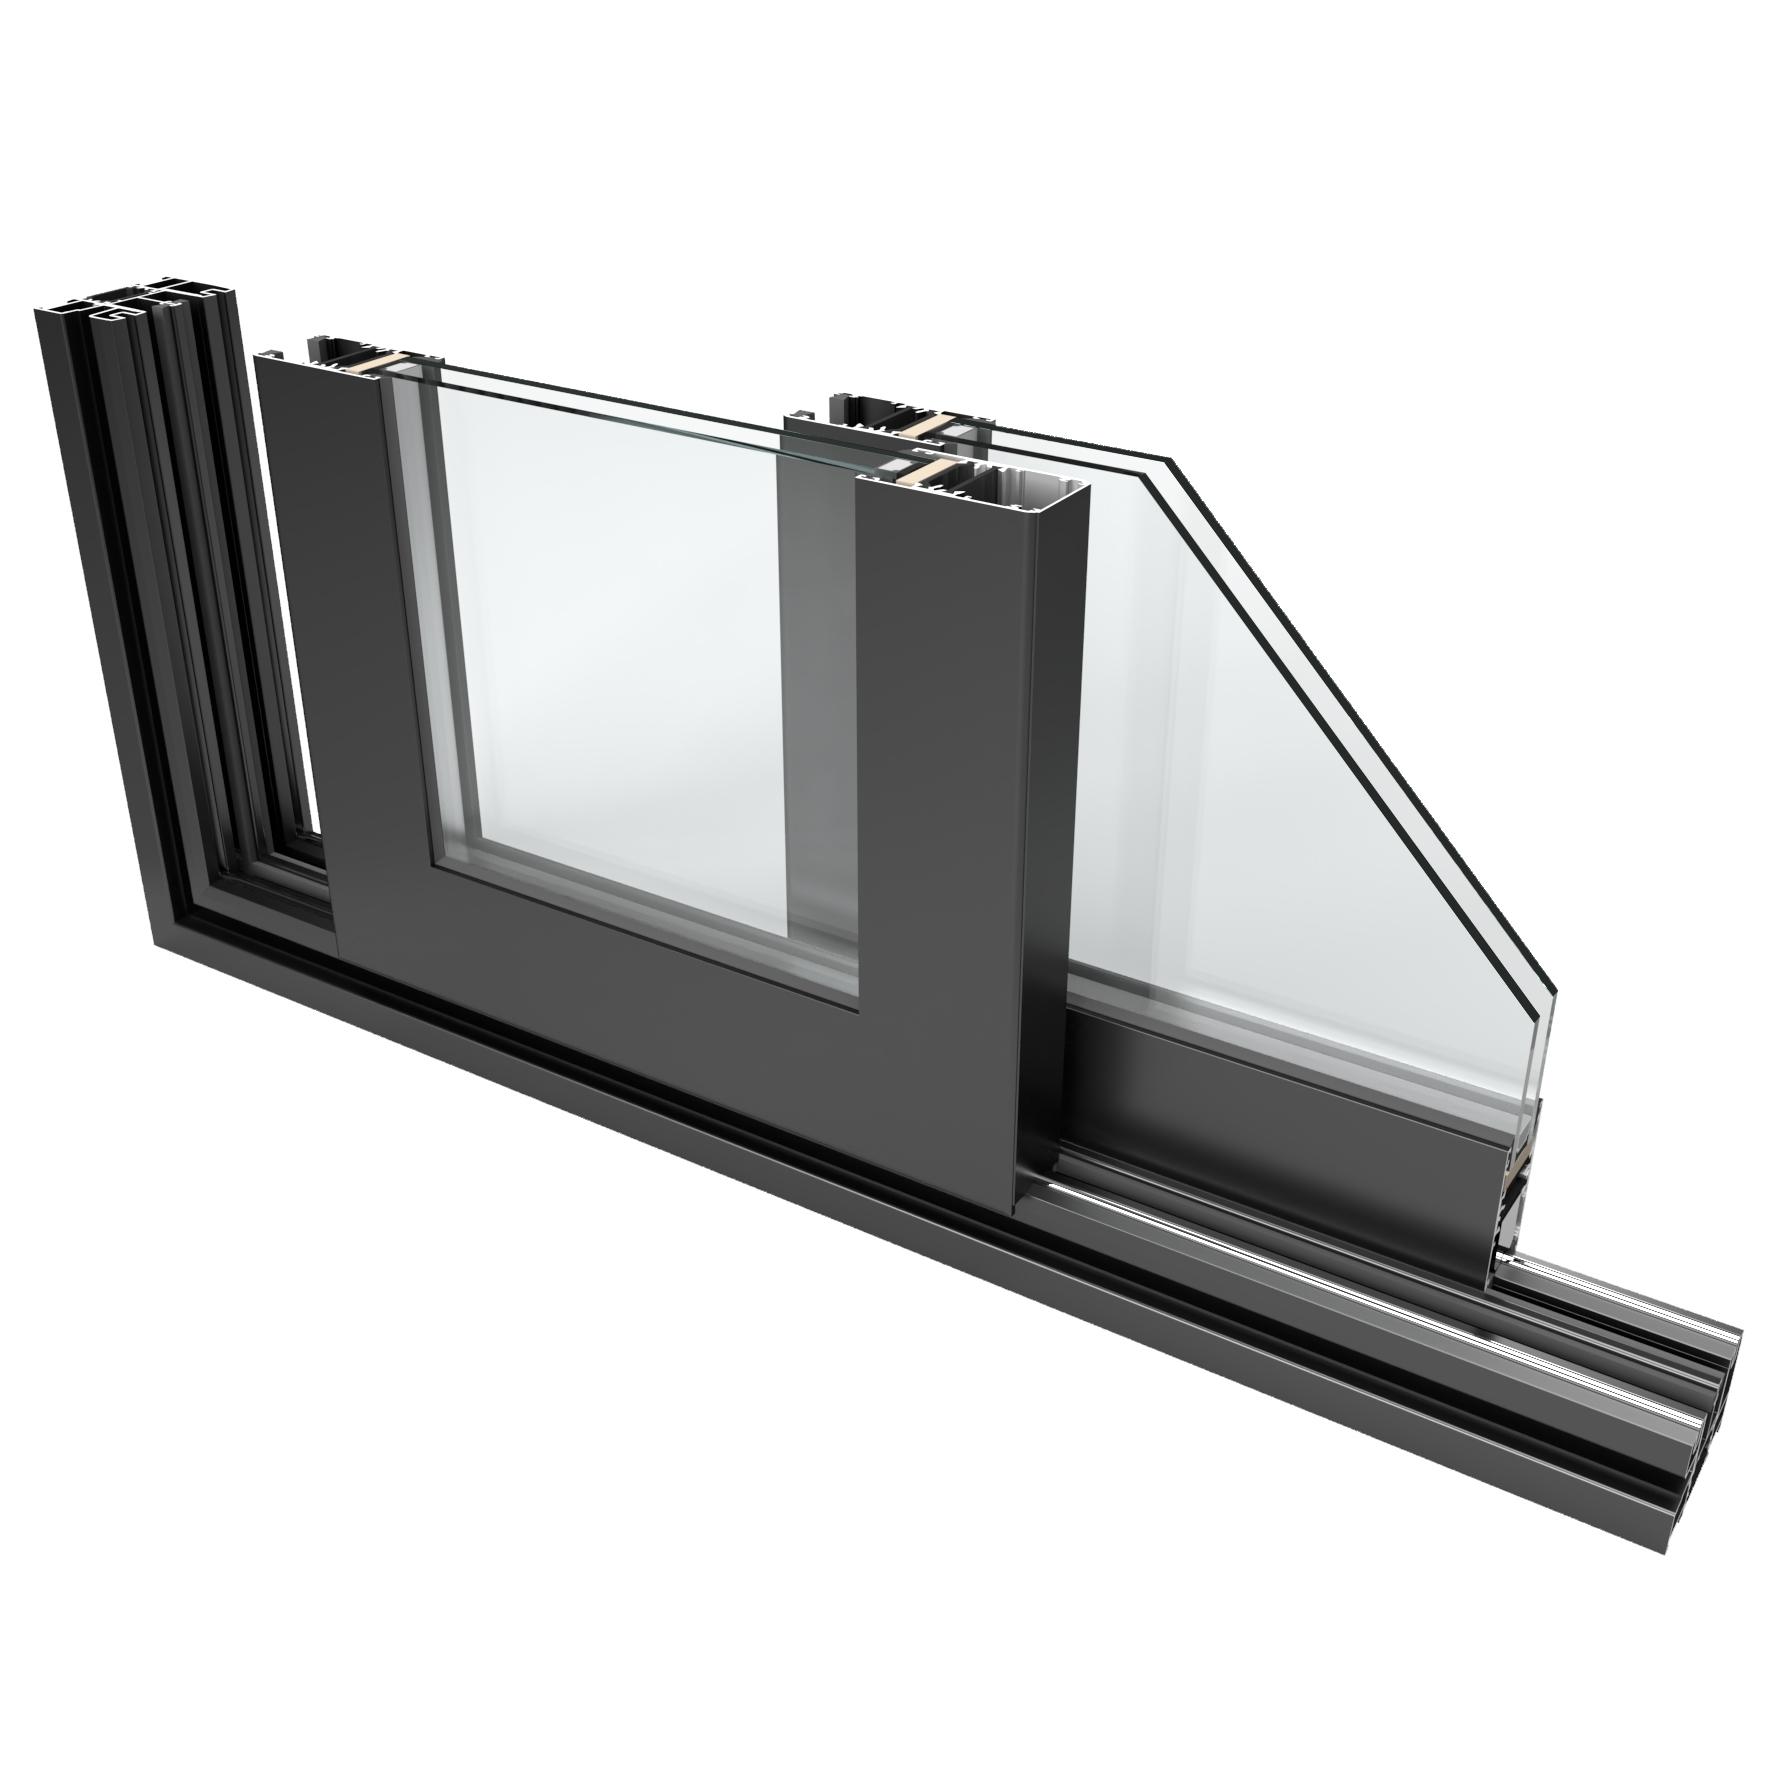 https://www.allpaint.it/wp-content/uploads/2021/07/scorrevoli-alluminio-78stta-allpaint.jpg